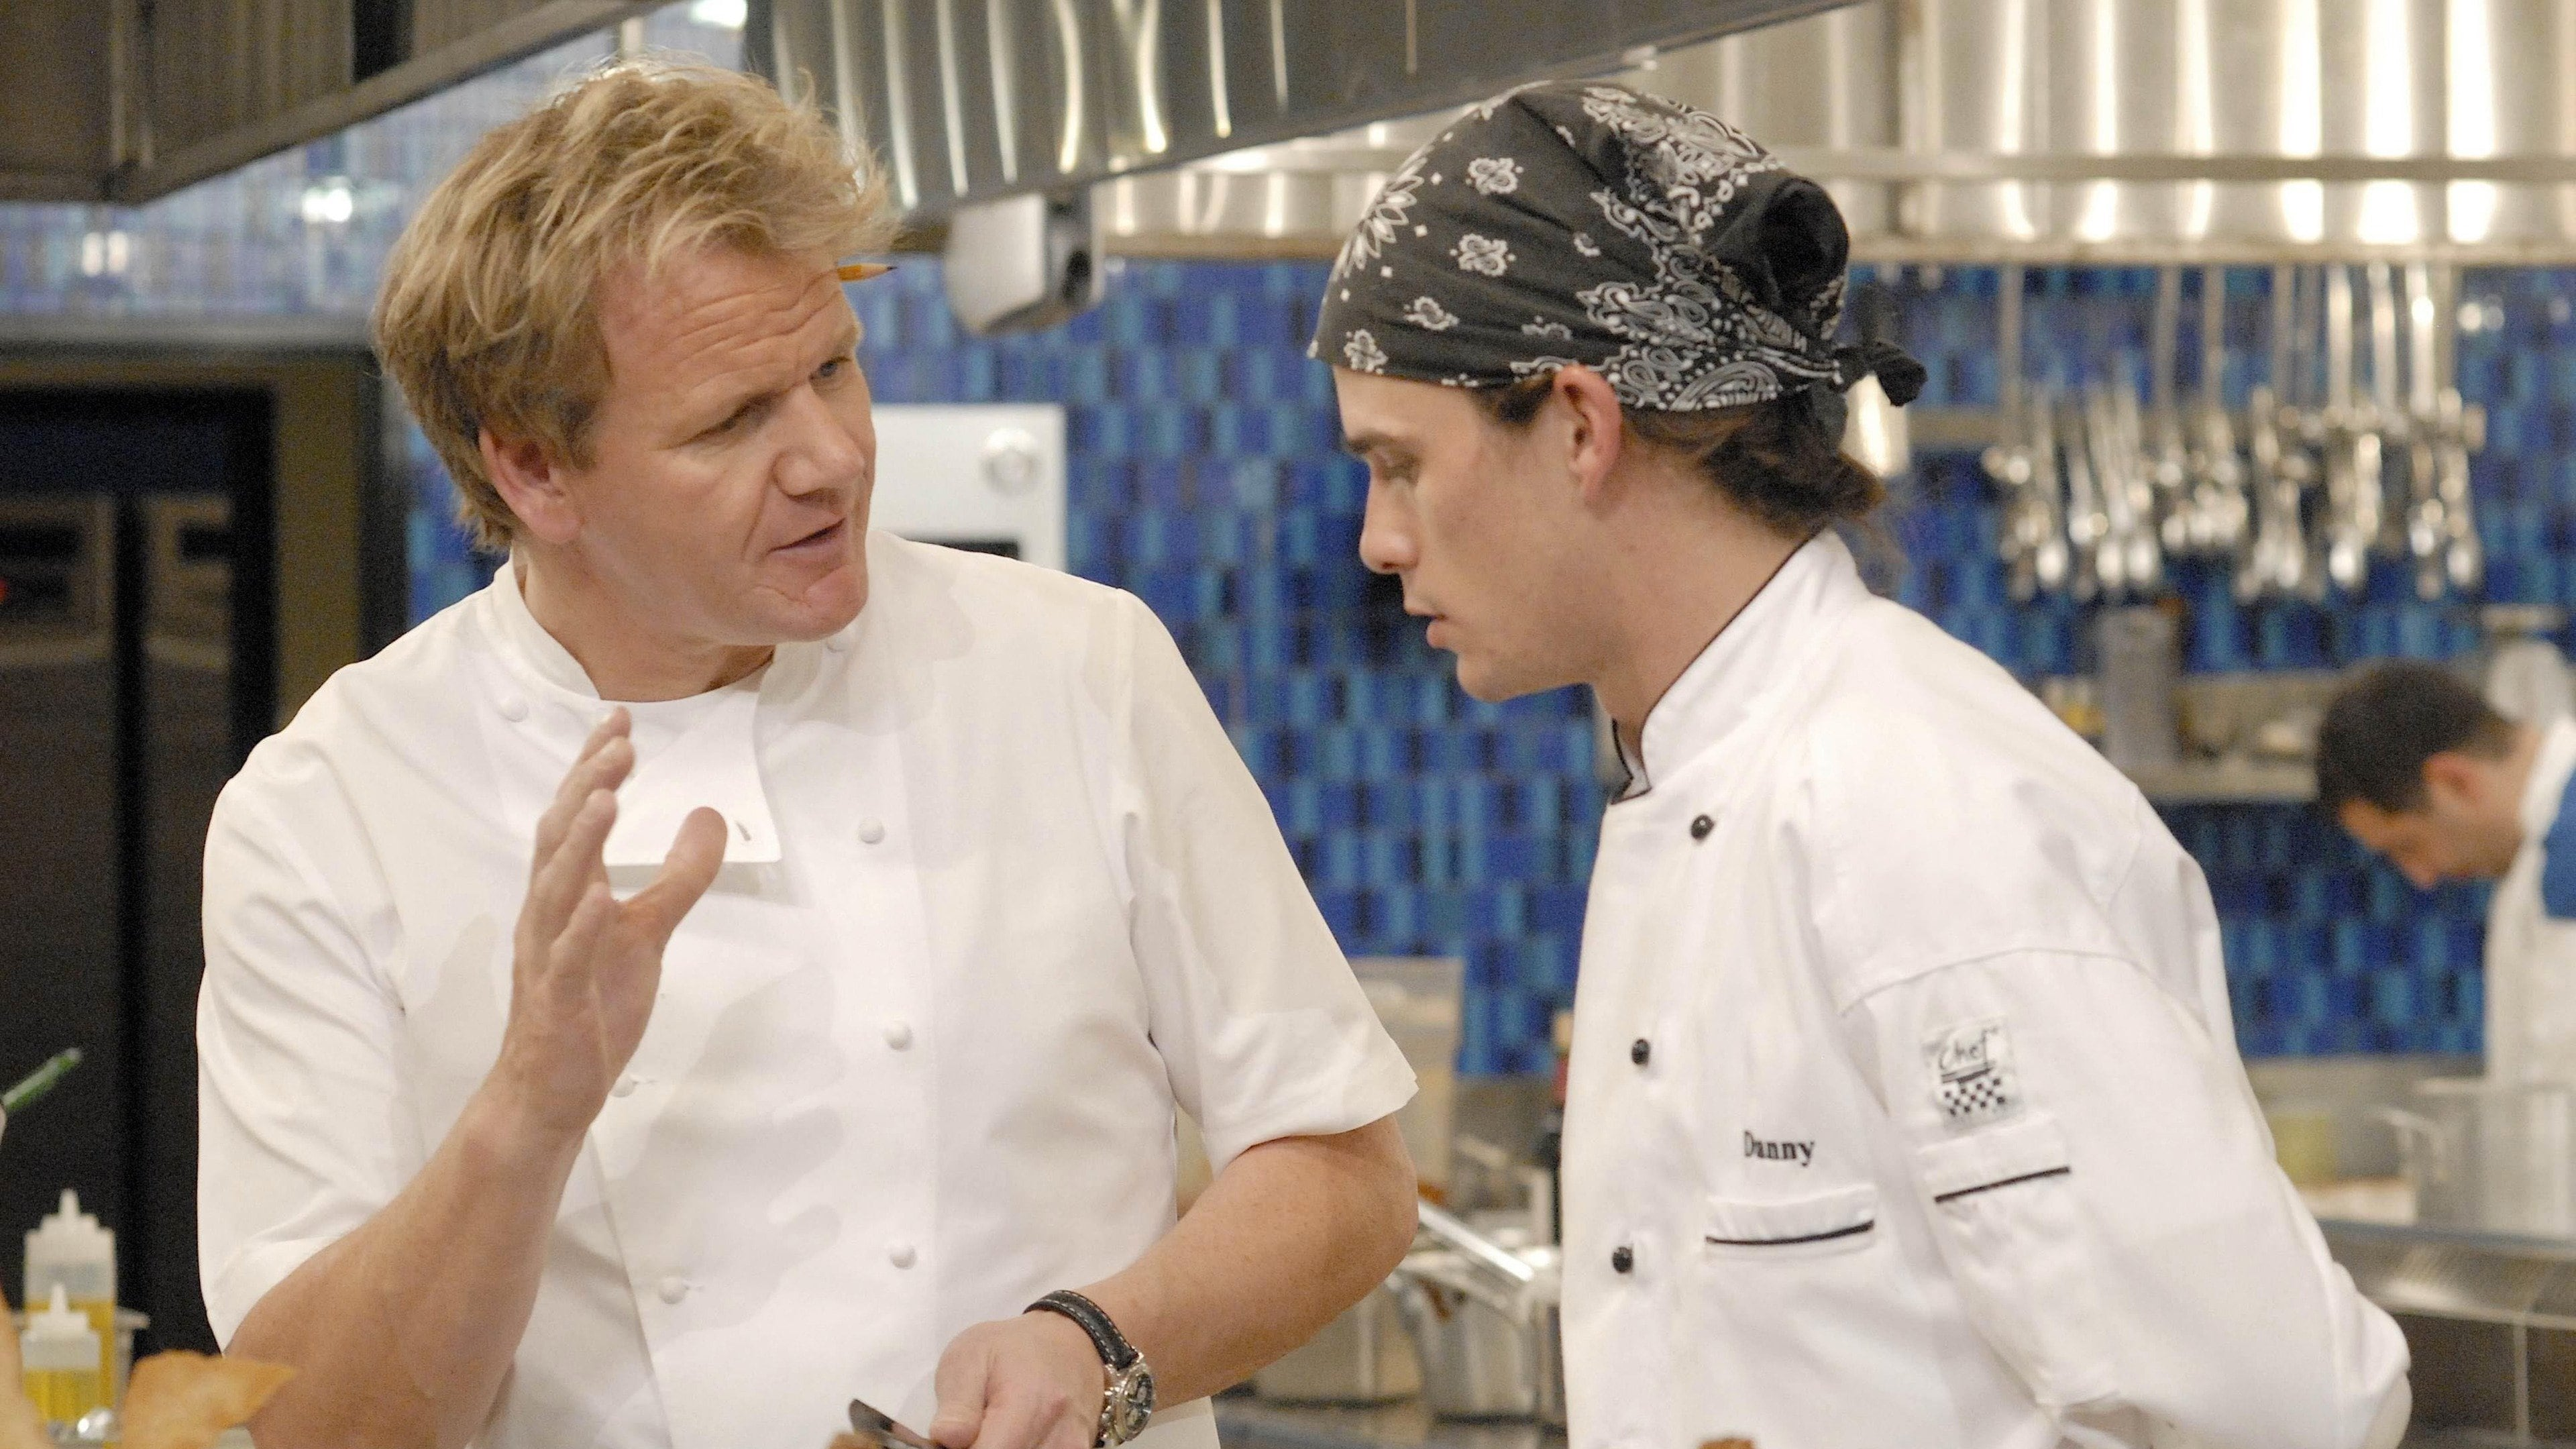 2 Chefs Compete: Part 2